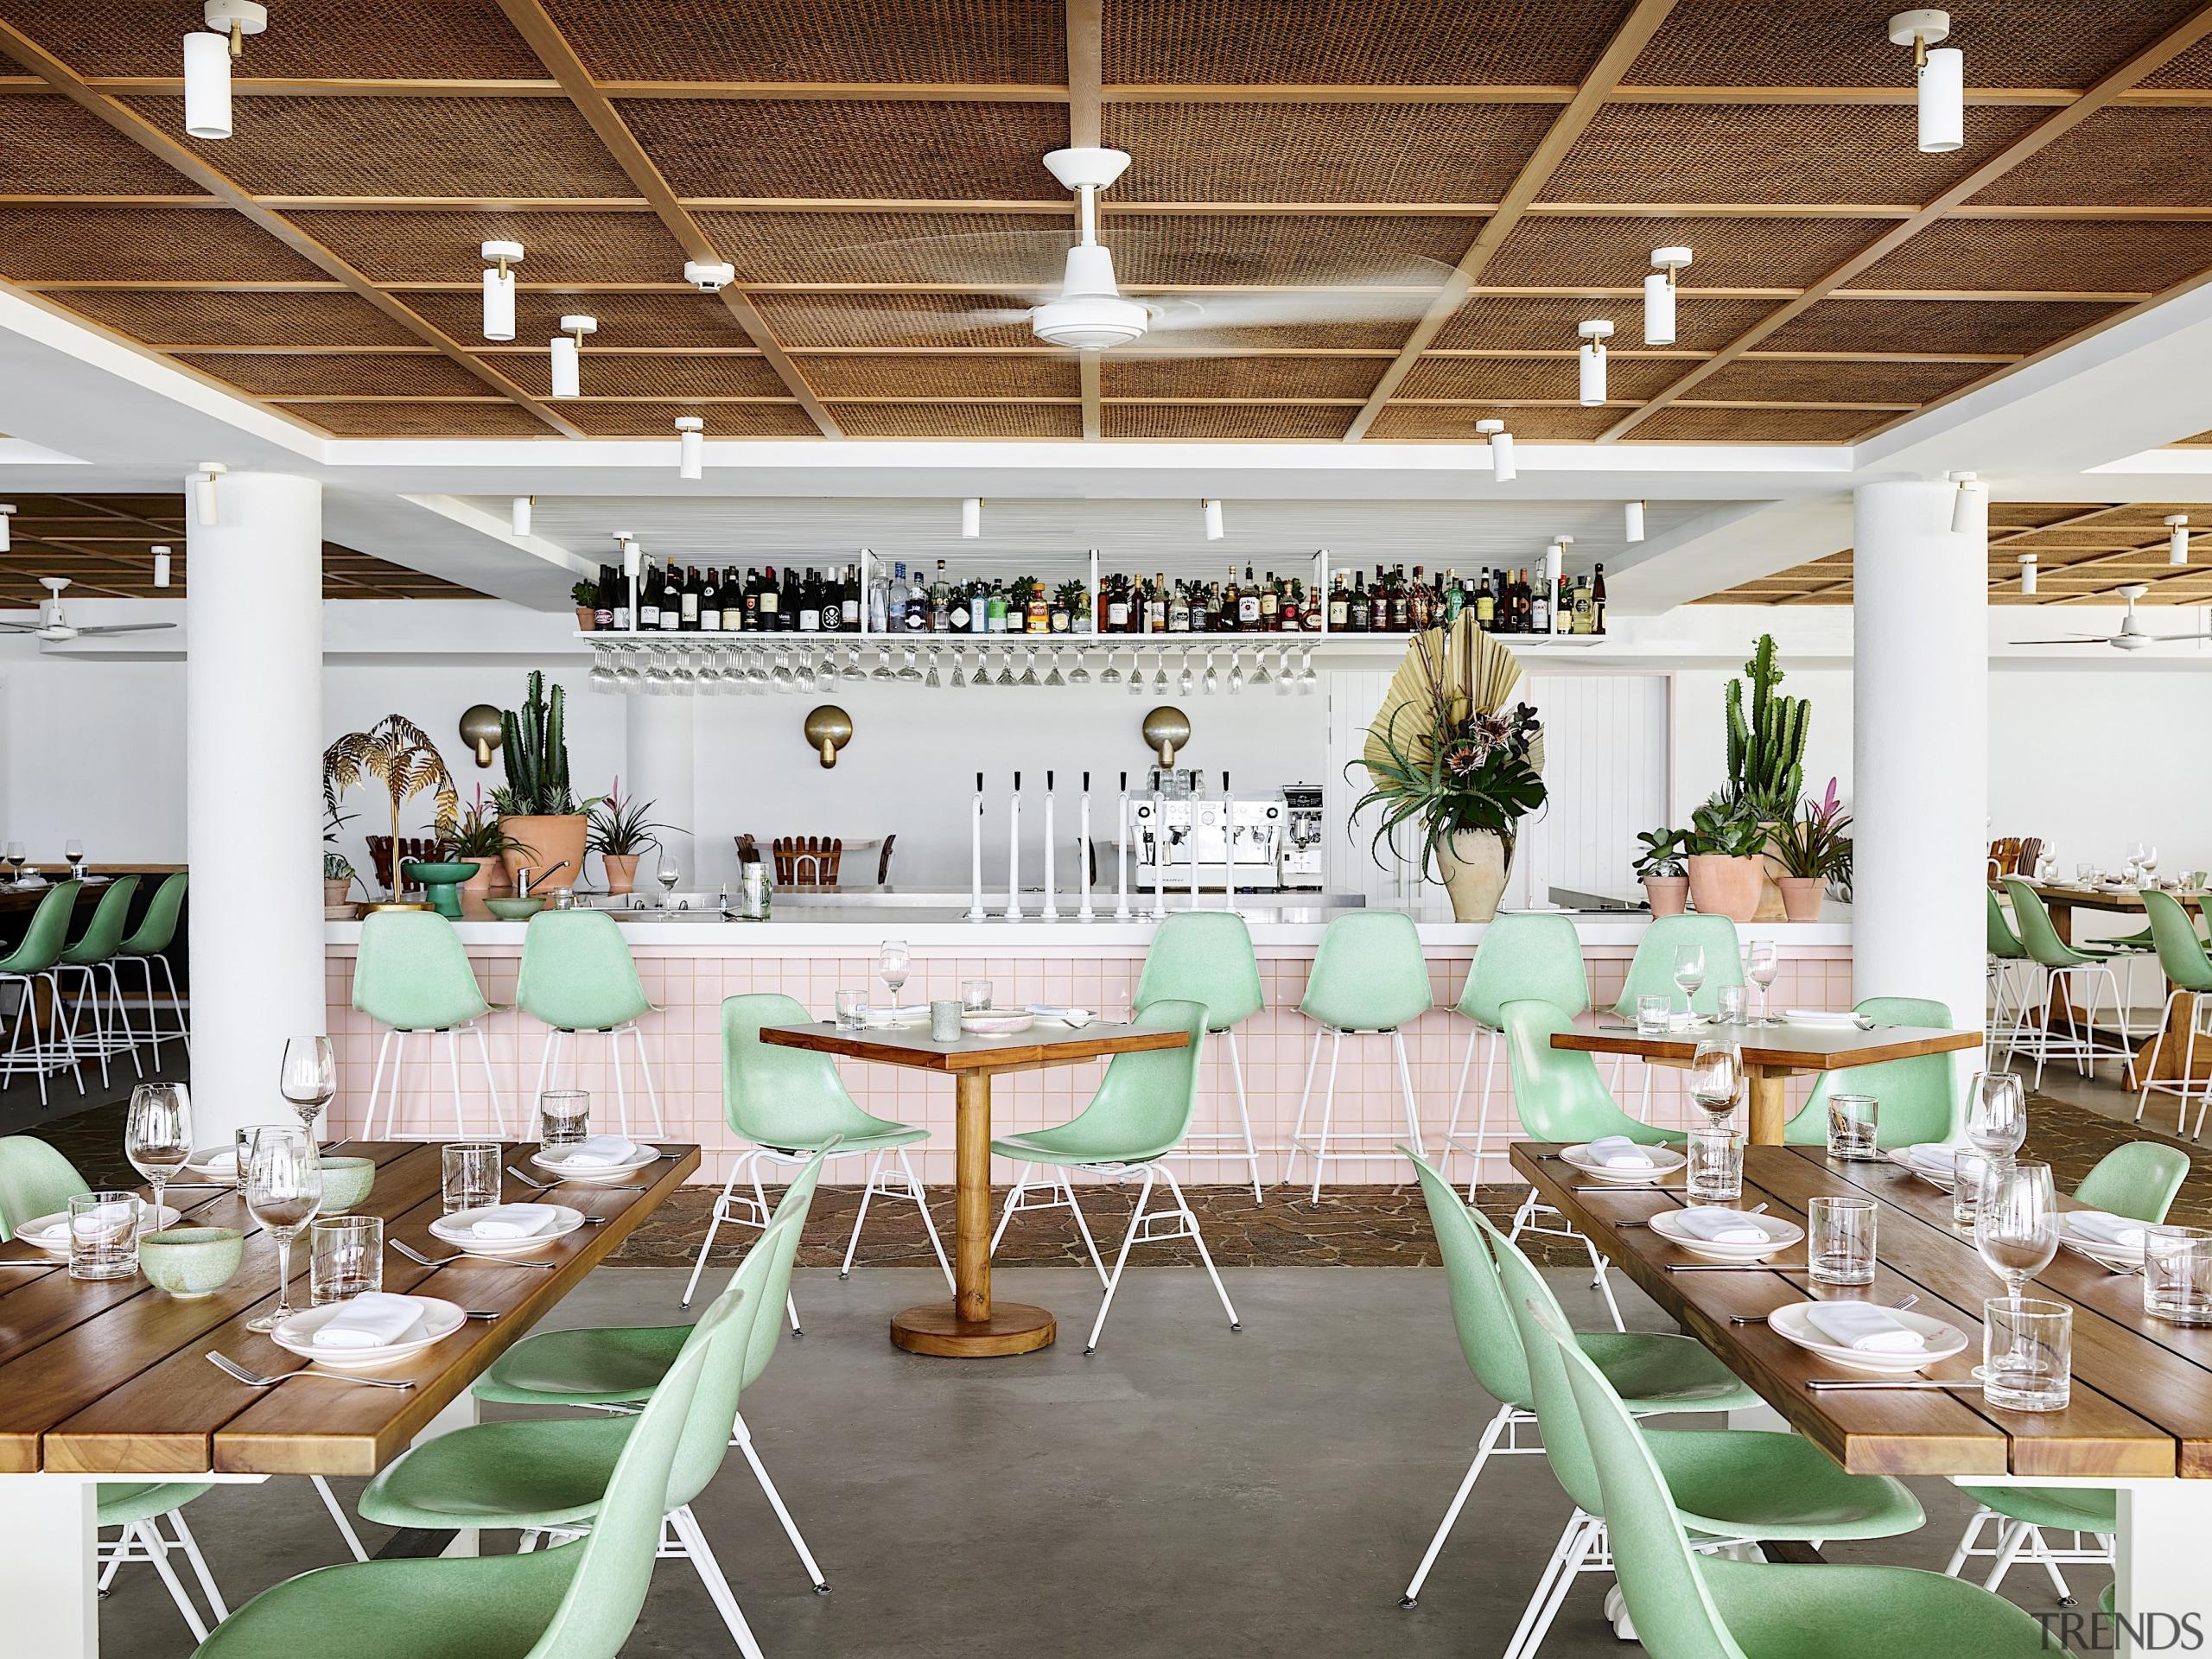 The Tropic restaurant at Burleigh Heads Pavilion exudes